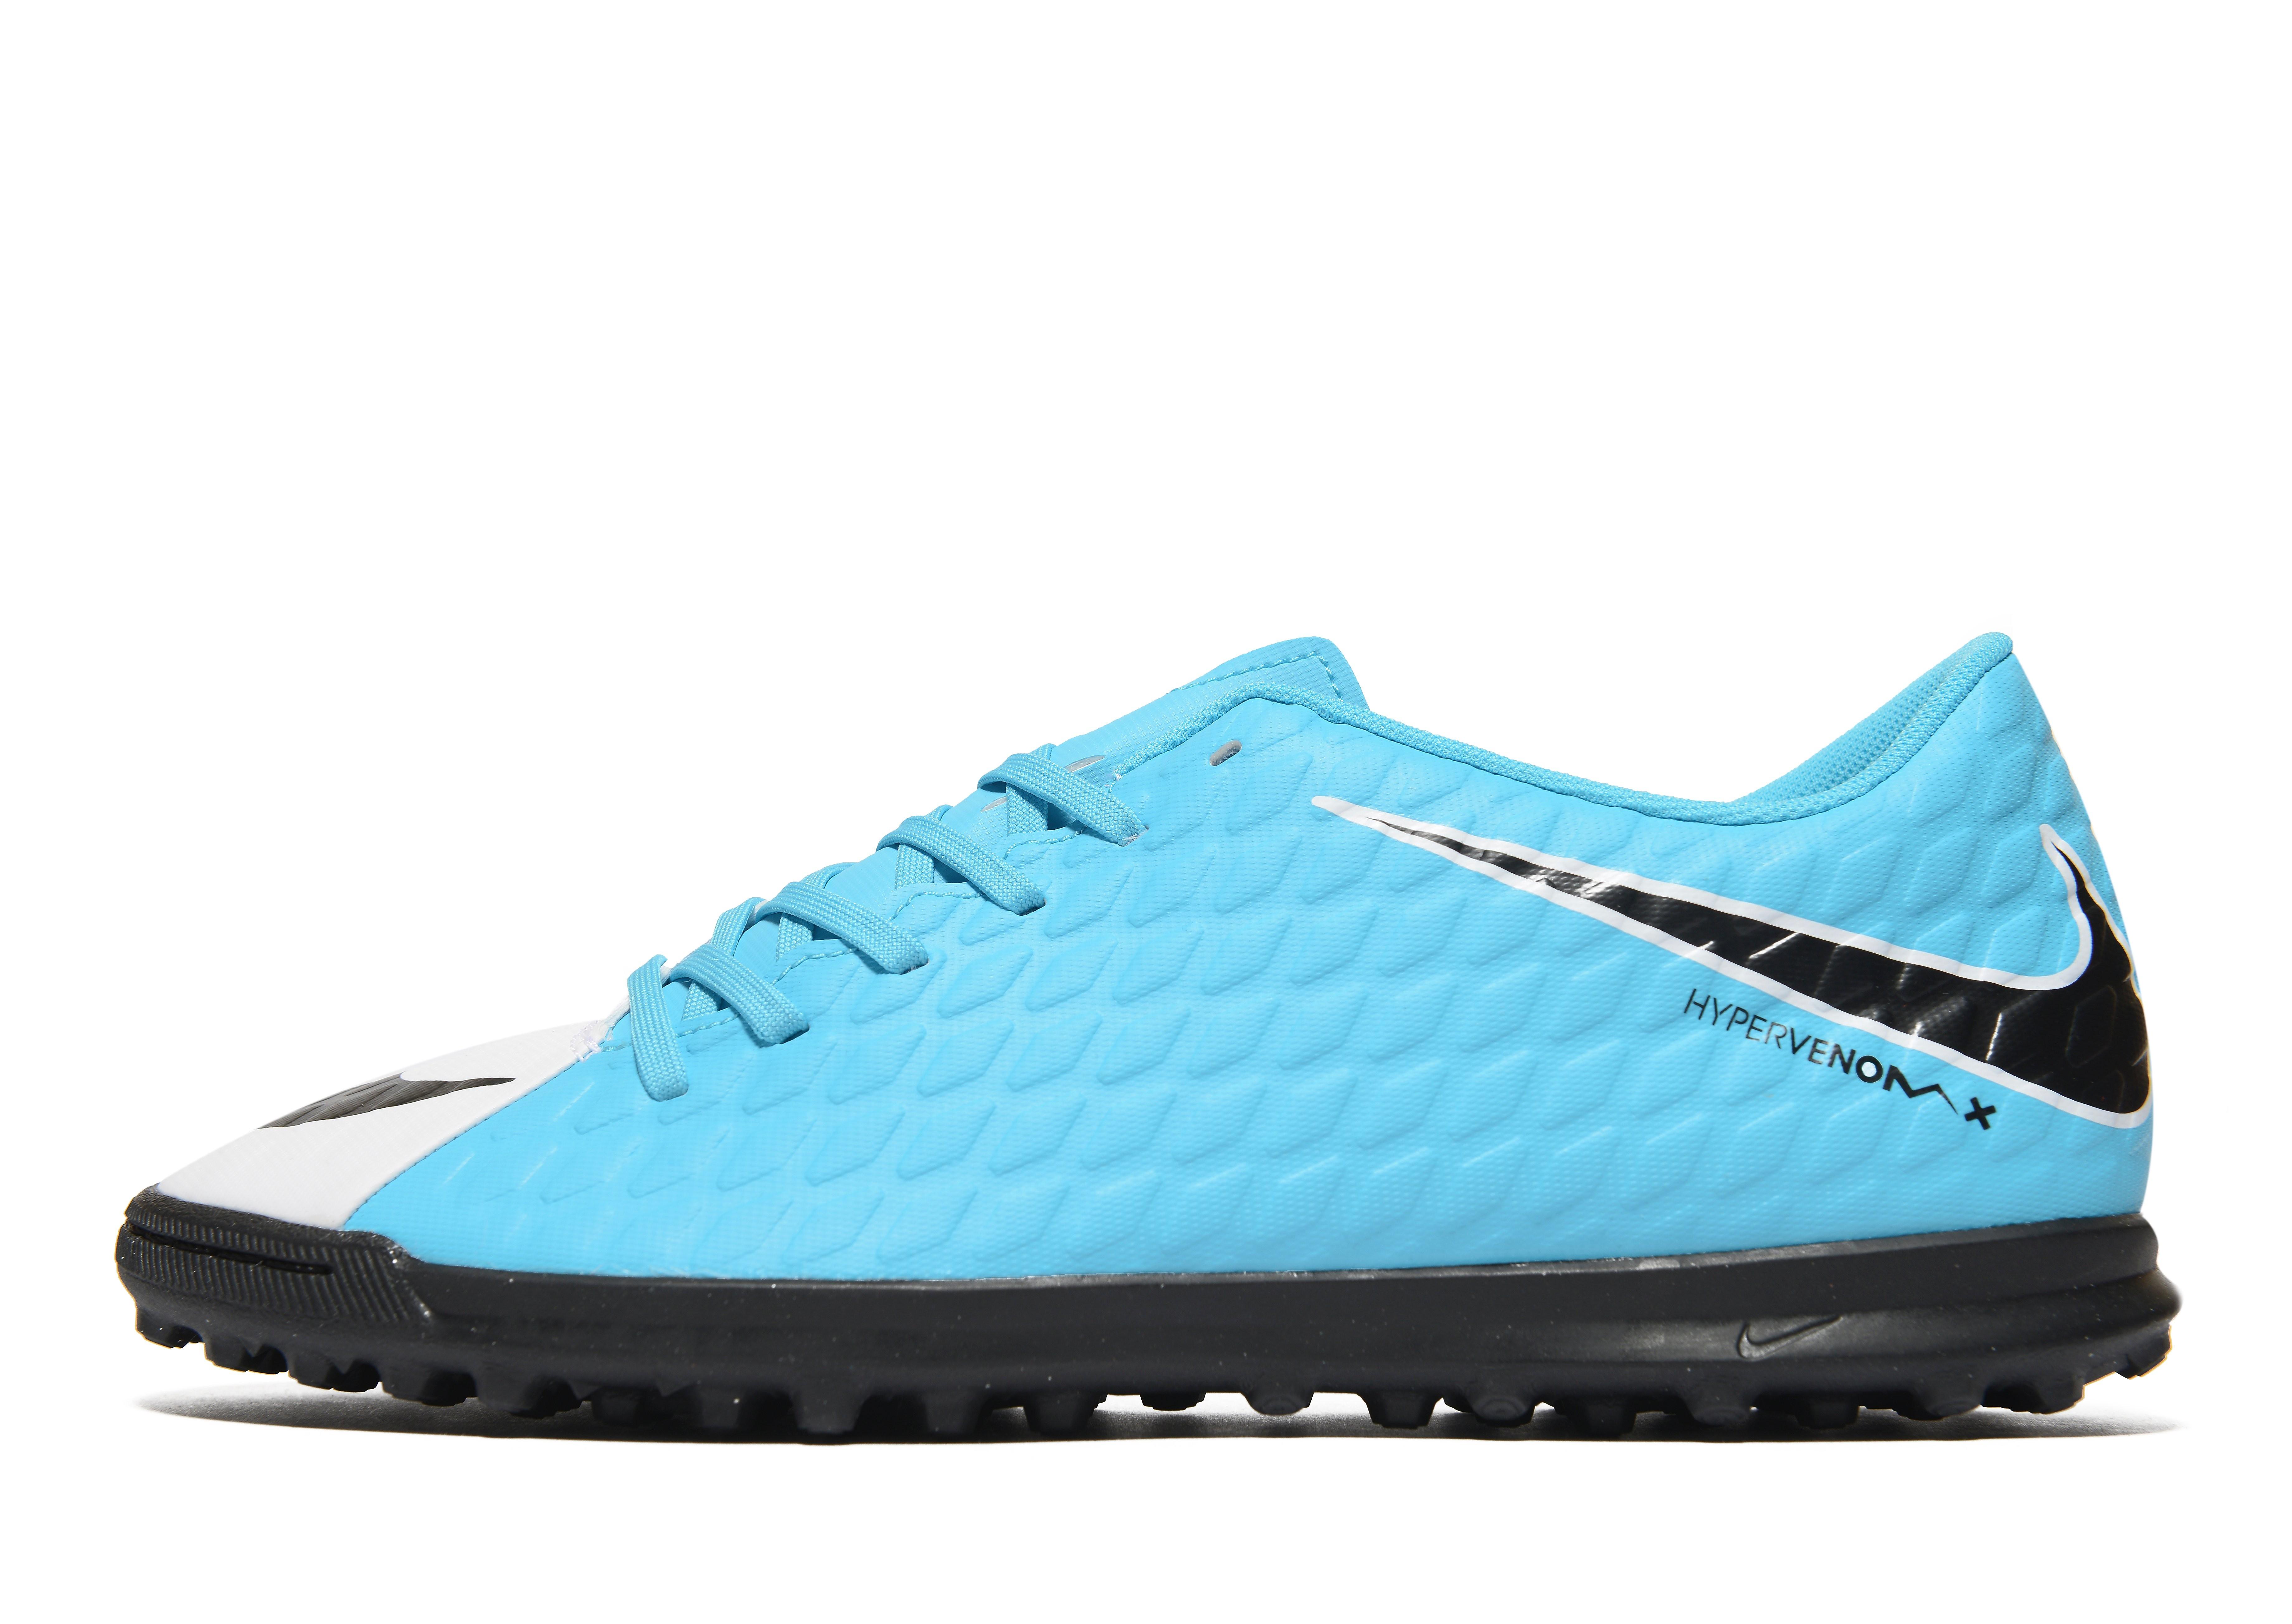 Nike Motion Blur Hypervenom Phade II TF